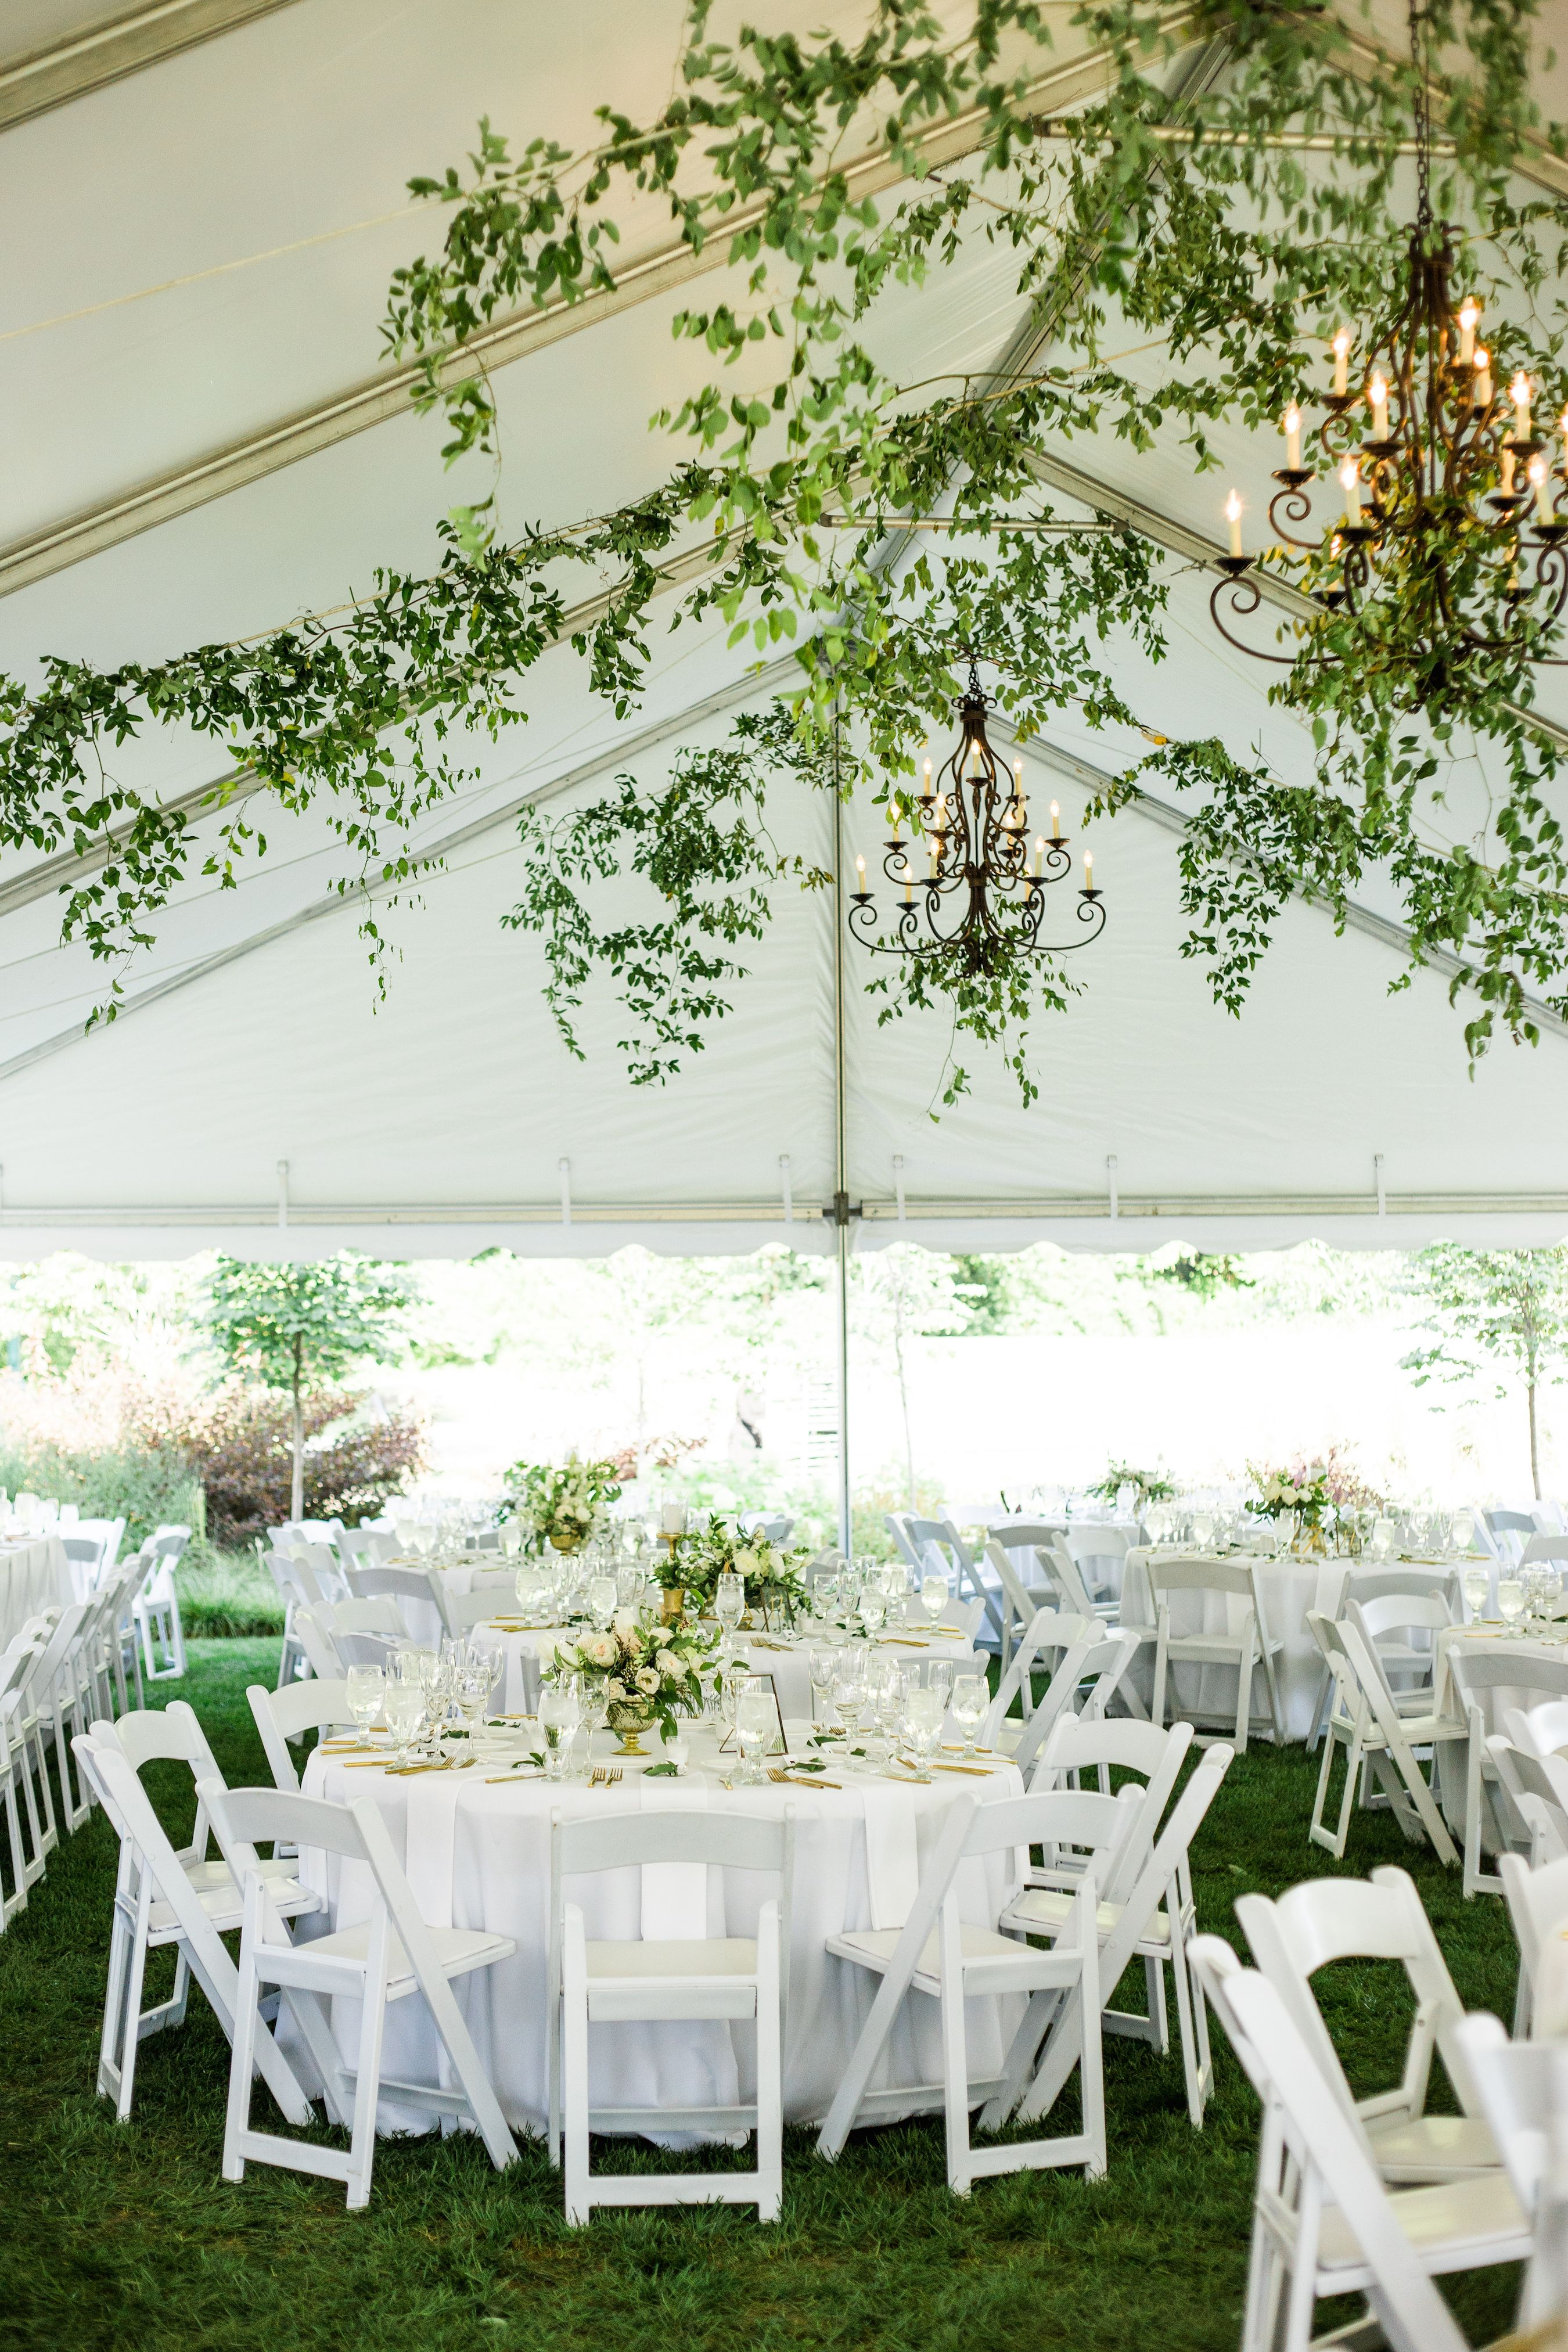 Posy Columbus Ohio Franklin Park Conservatory Adam Lowe Photography Greenery Wedding W White Tent Wedding Wedding Tent Decorations Tent Wedding Reception